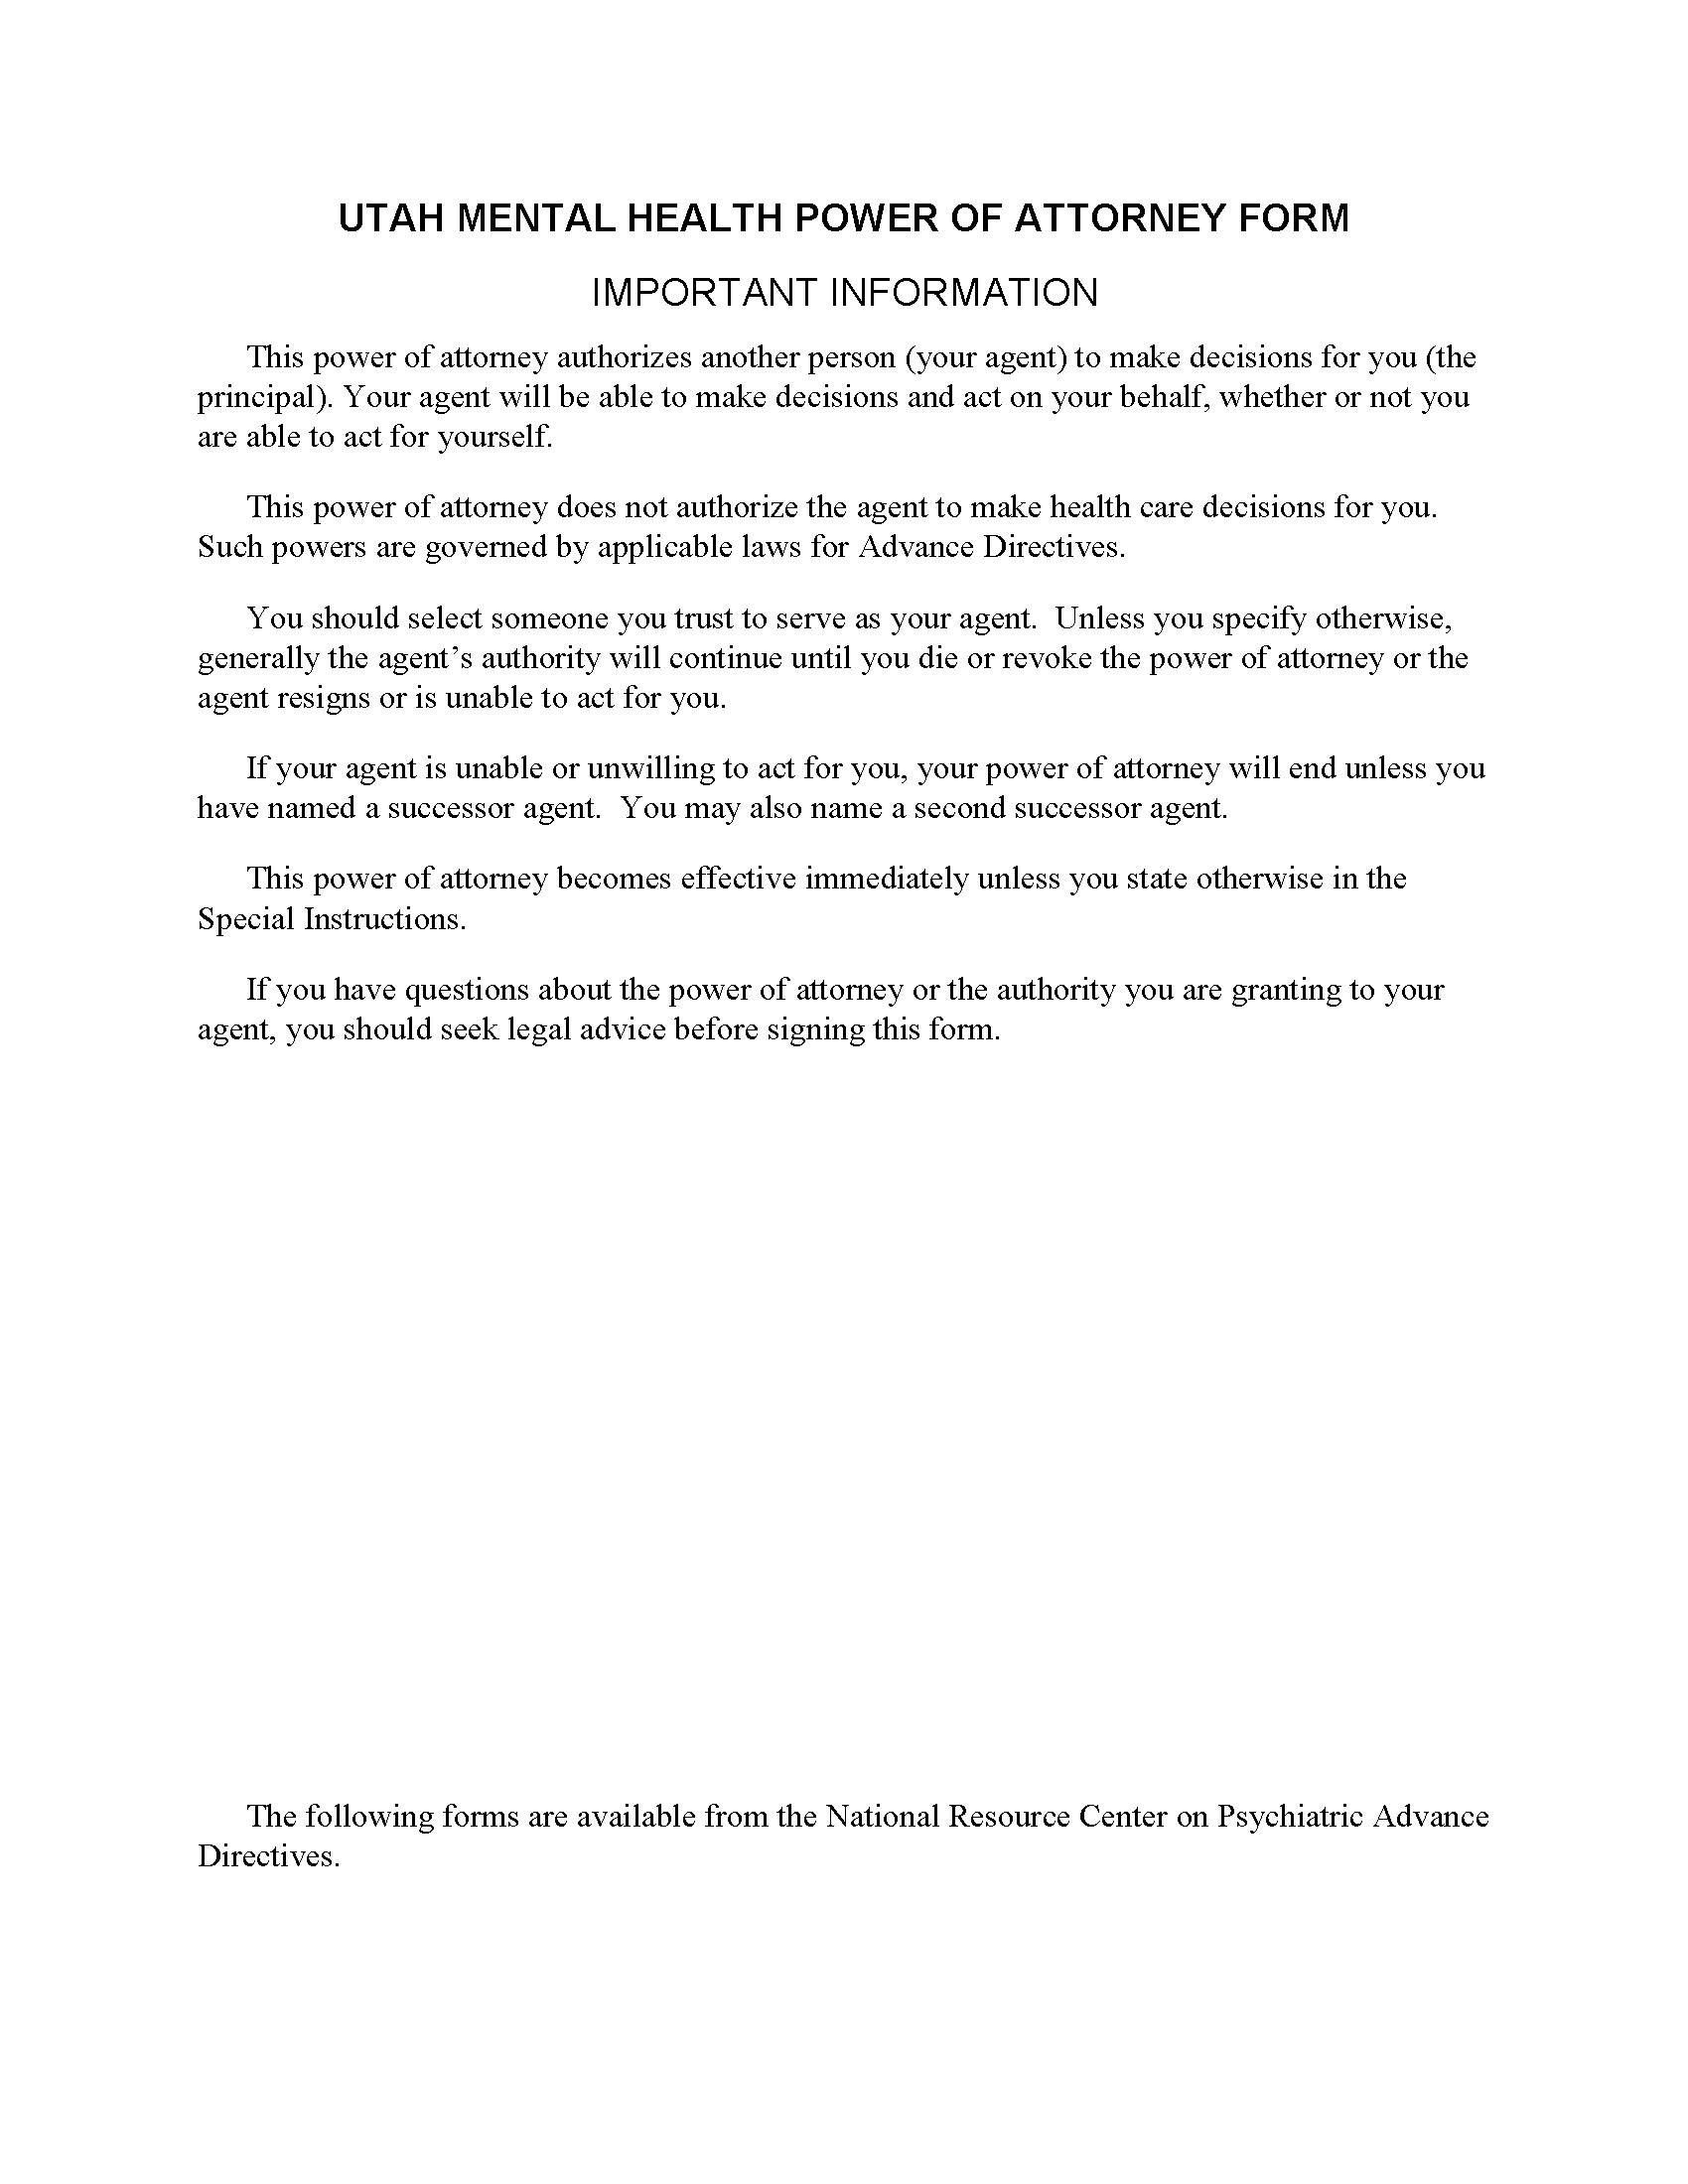 Utah Mental Health Power of Attorney